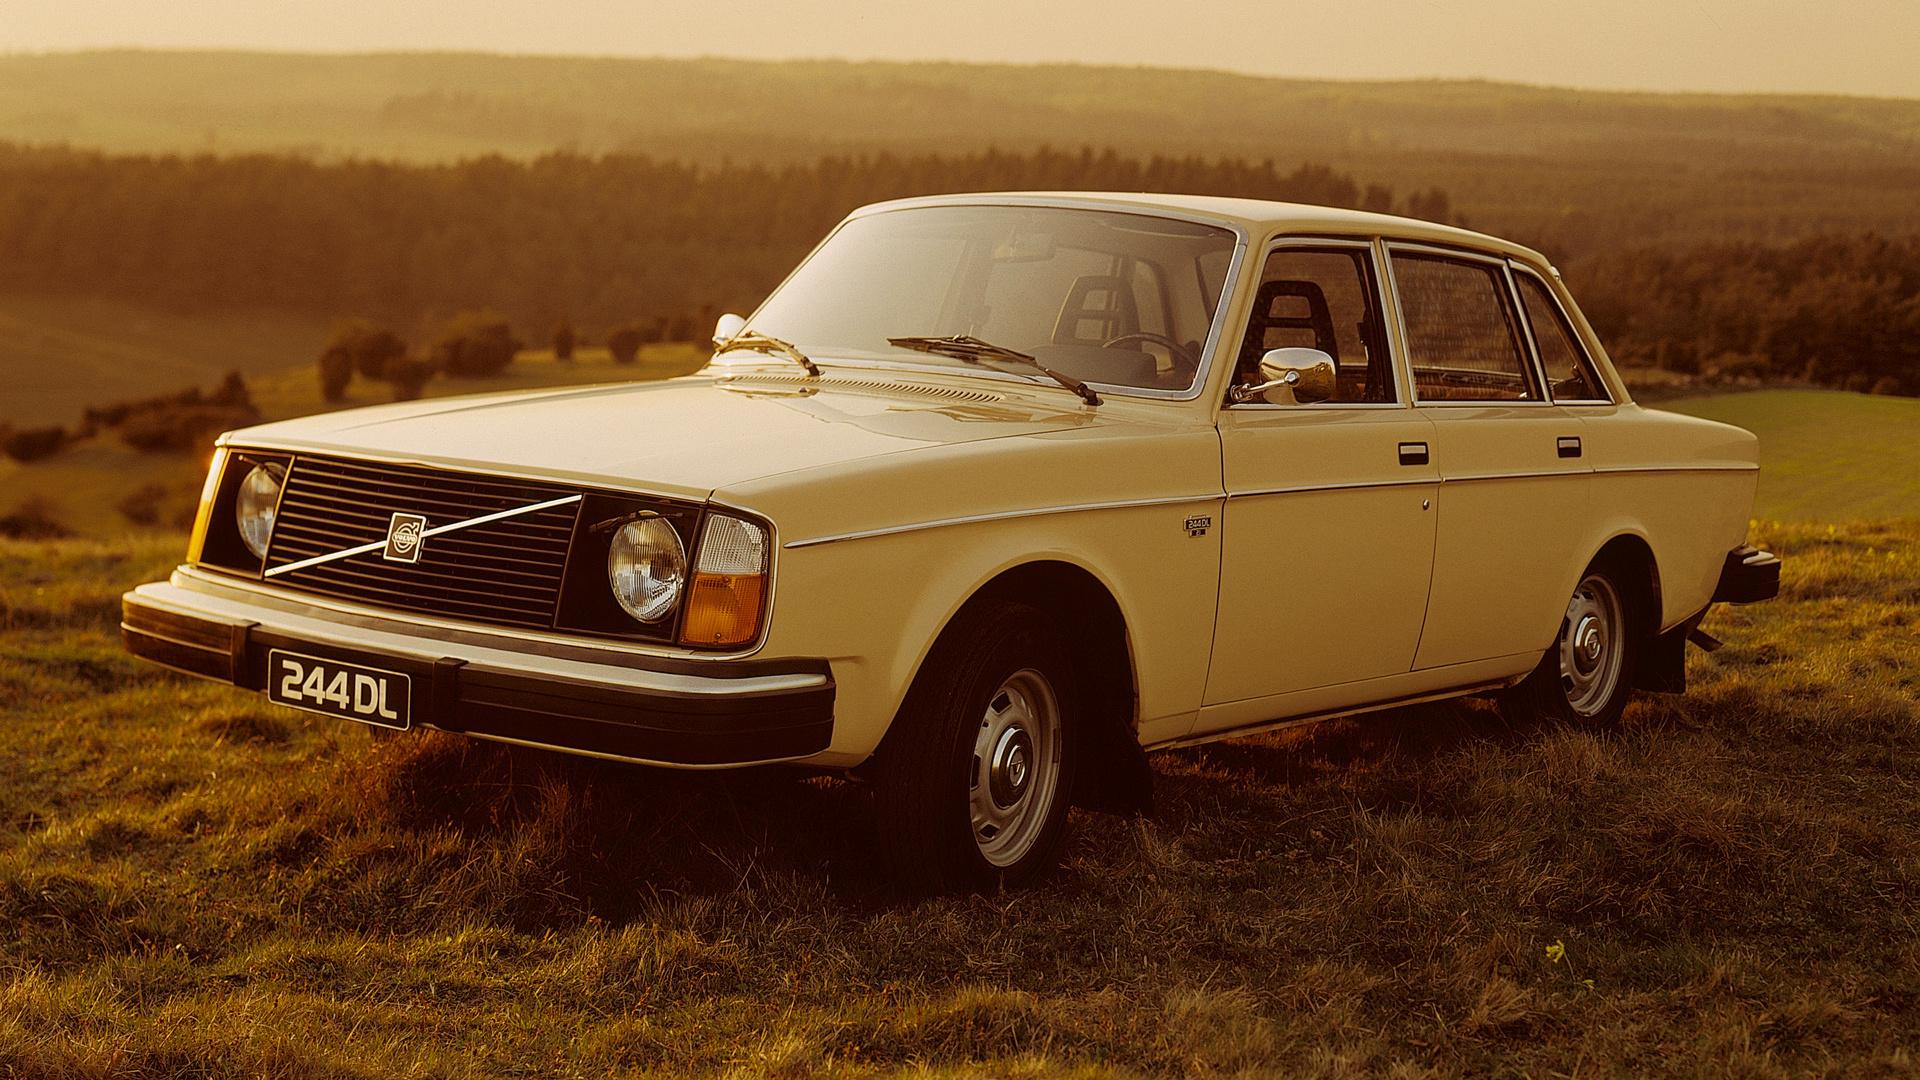 1975 Volvo 244 Dl Hd Wallpaper Background Image 1920x1080 Id